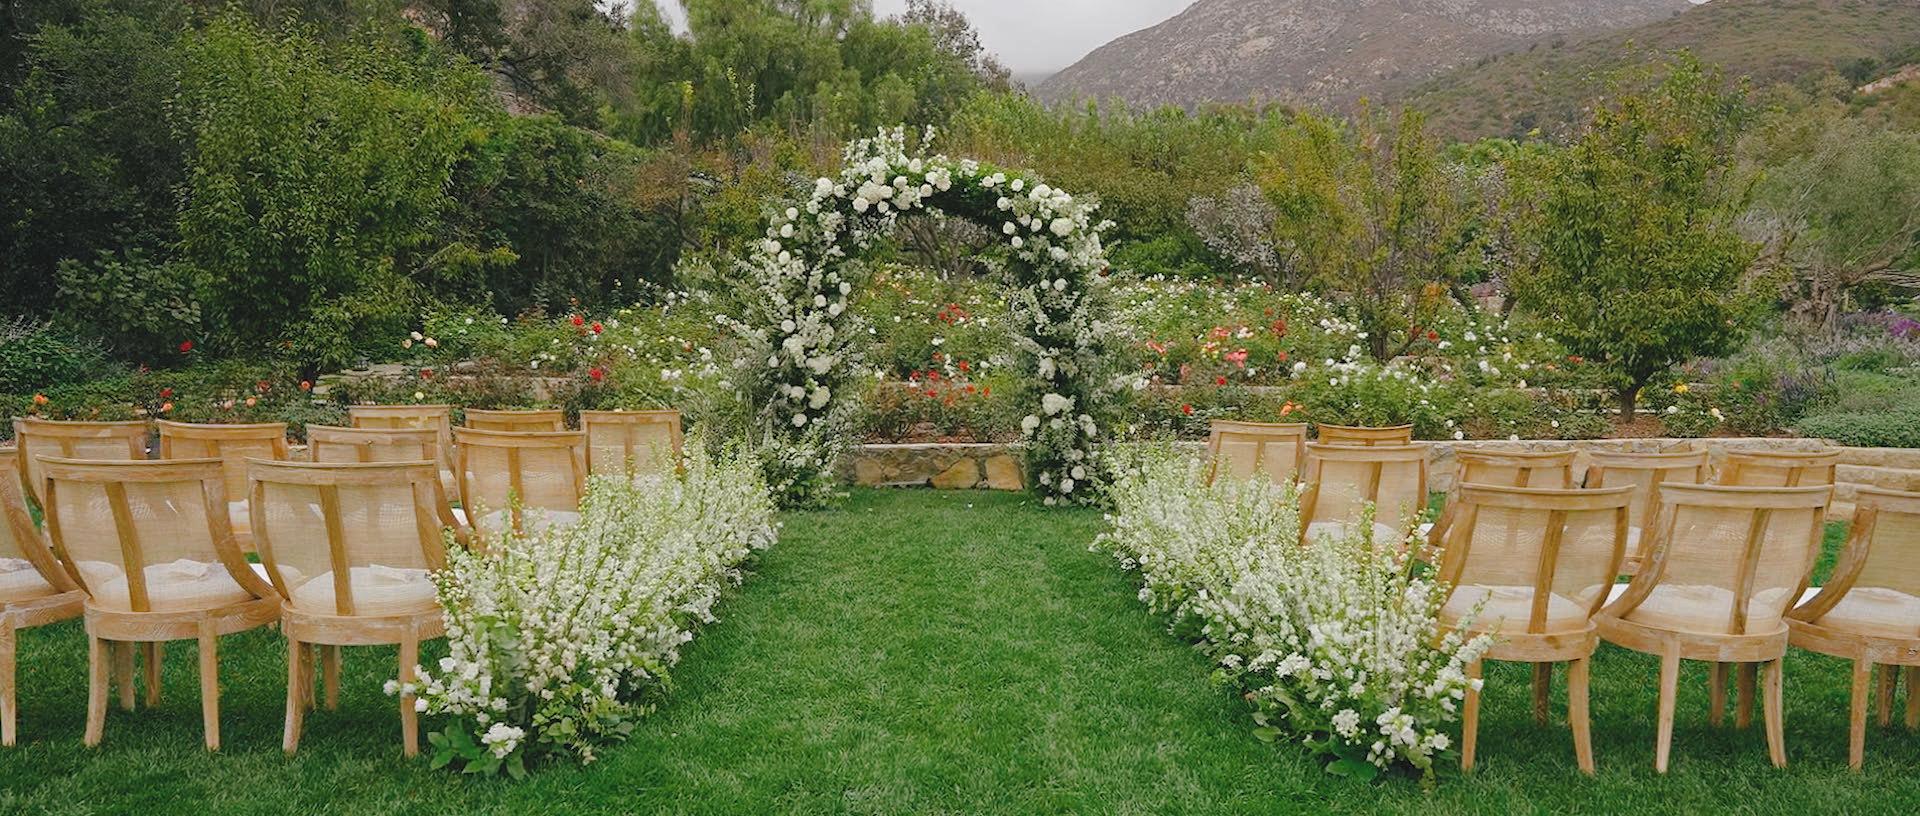 san ysidro wedding, ceremony site, santa barbara weddings, southern california wedding videographers, san ysidro wedding videographers, santa barabara wedding videographers